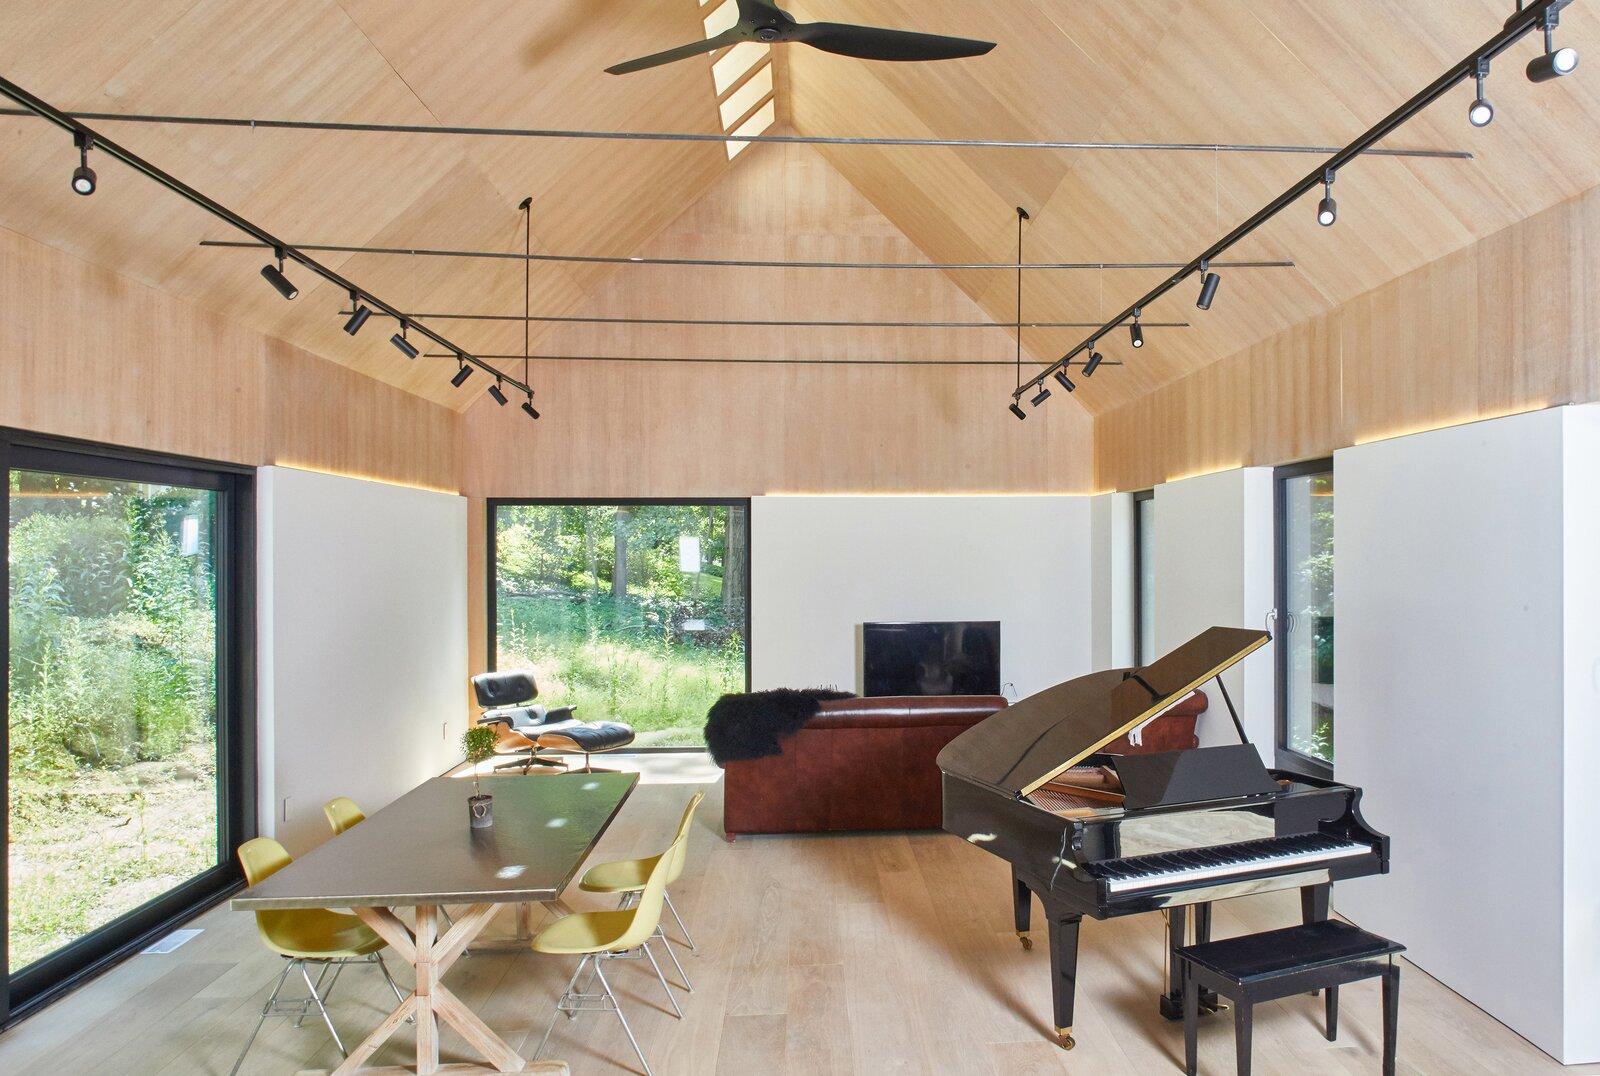 Living Room, Sofa, Track Lighting, Light Hardwood Floor, Chair, Accent Lighting, Ottomans, and Plywood Floor Great Room  Cork Haven by Multitude Studio